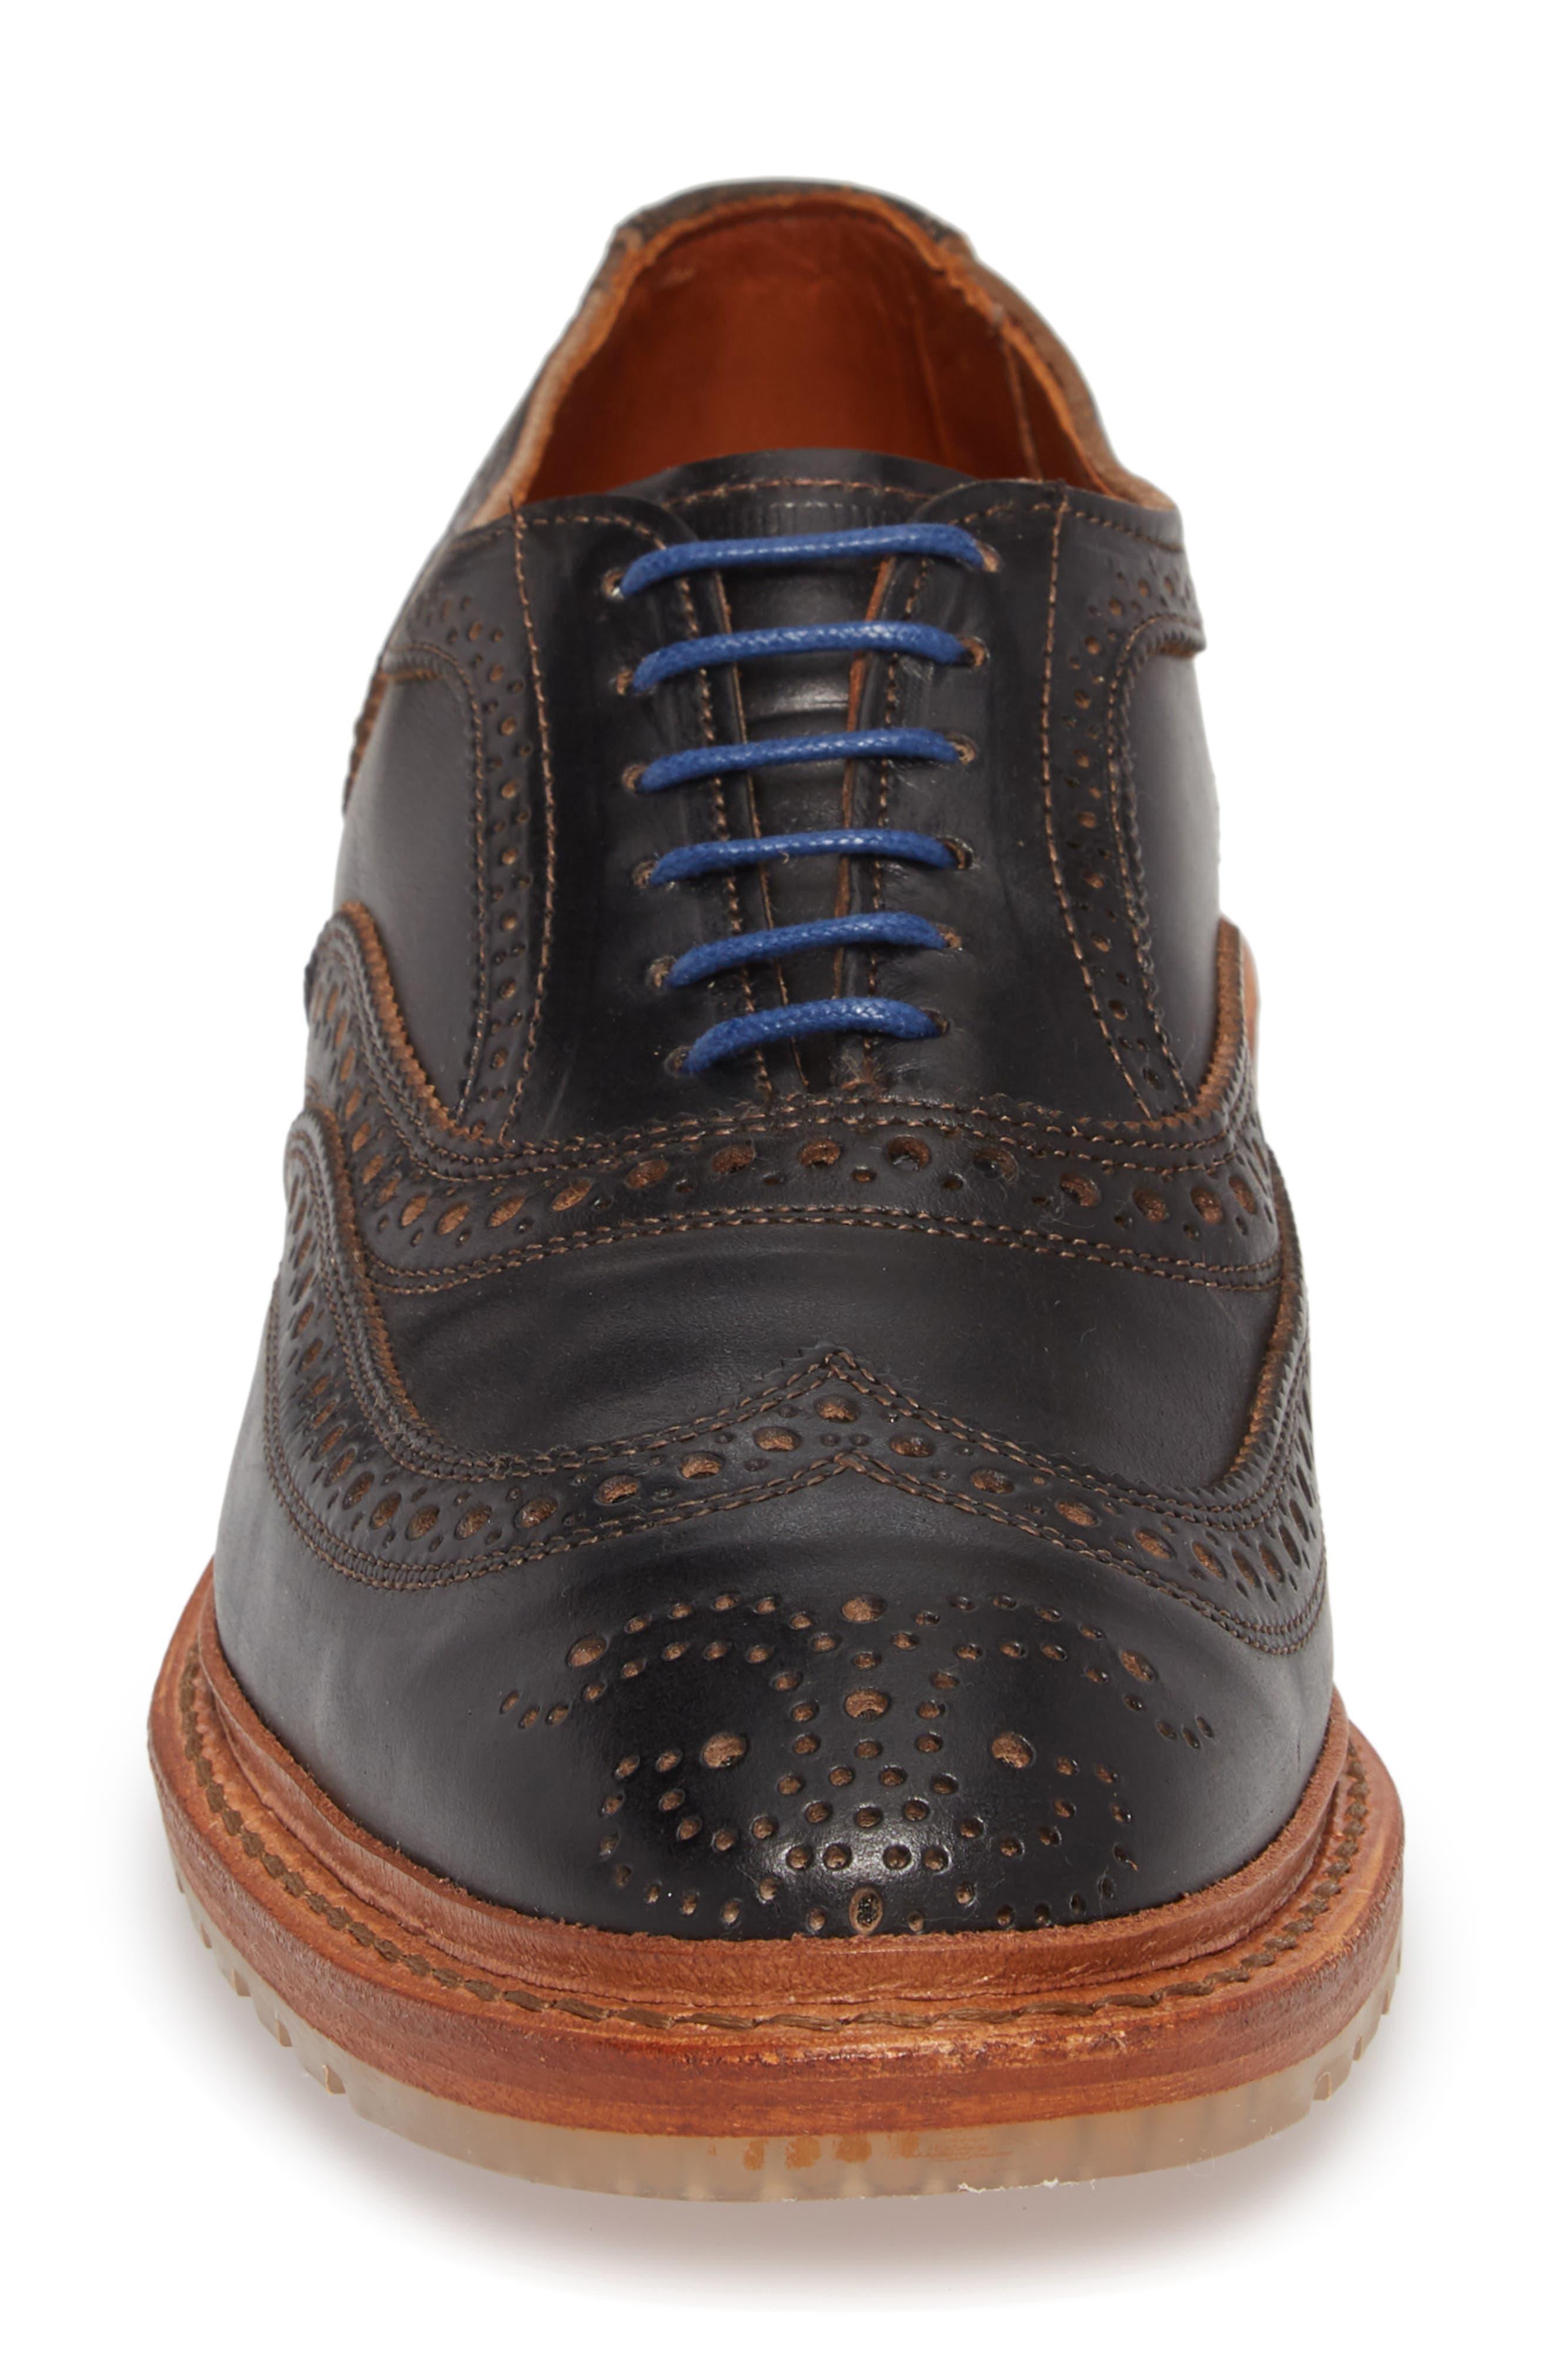 McTavish Lugged Wingtip,                             Alternate thumbnail 4, color,                             Black Leather